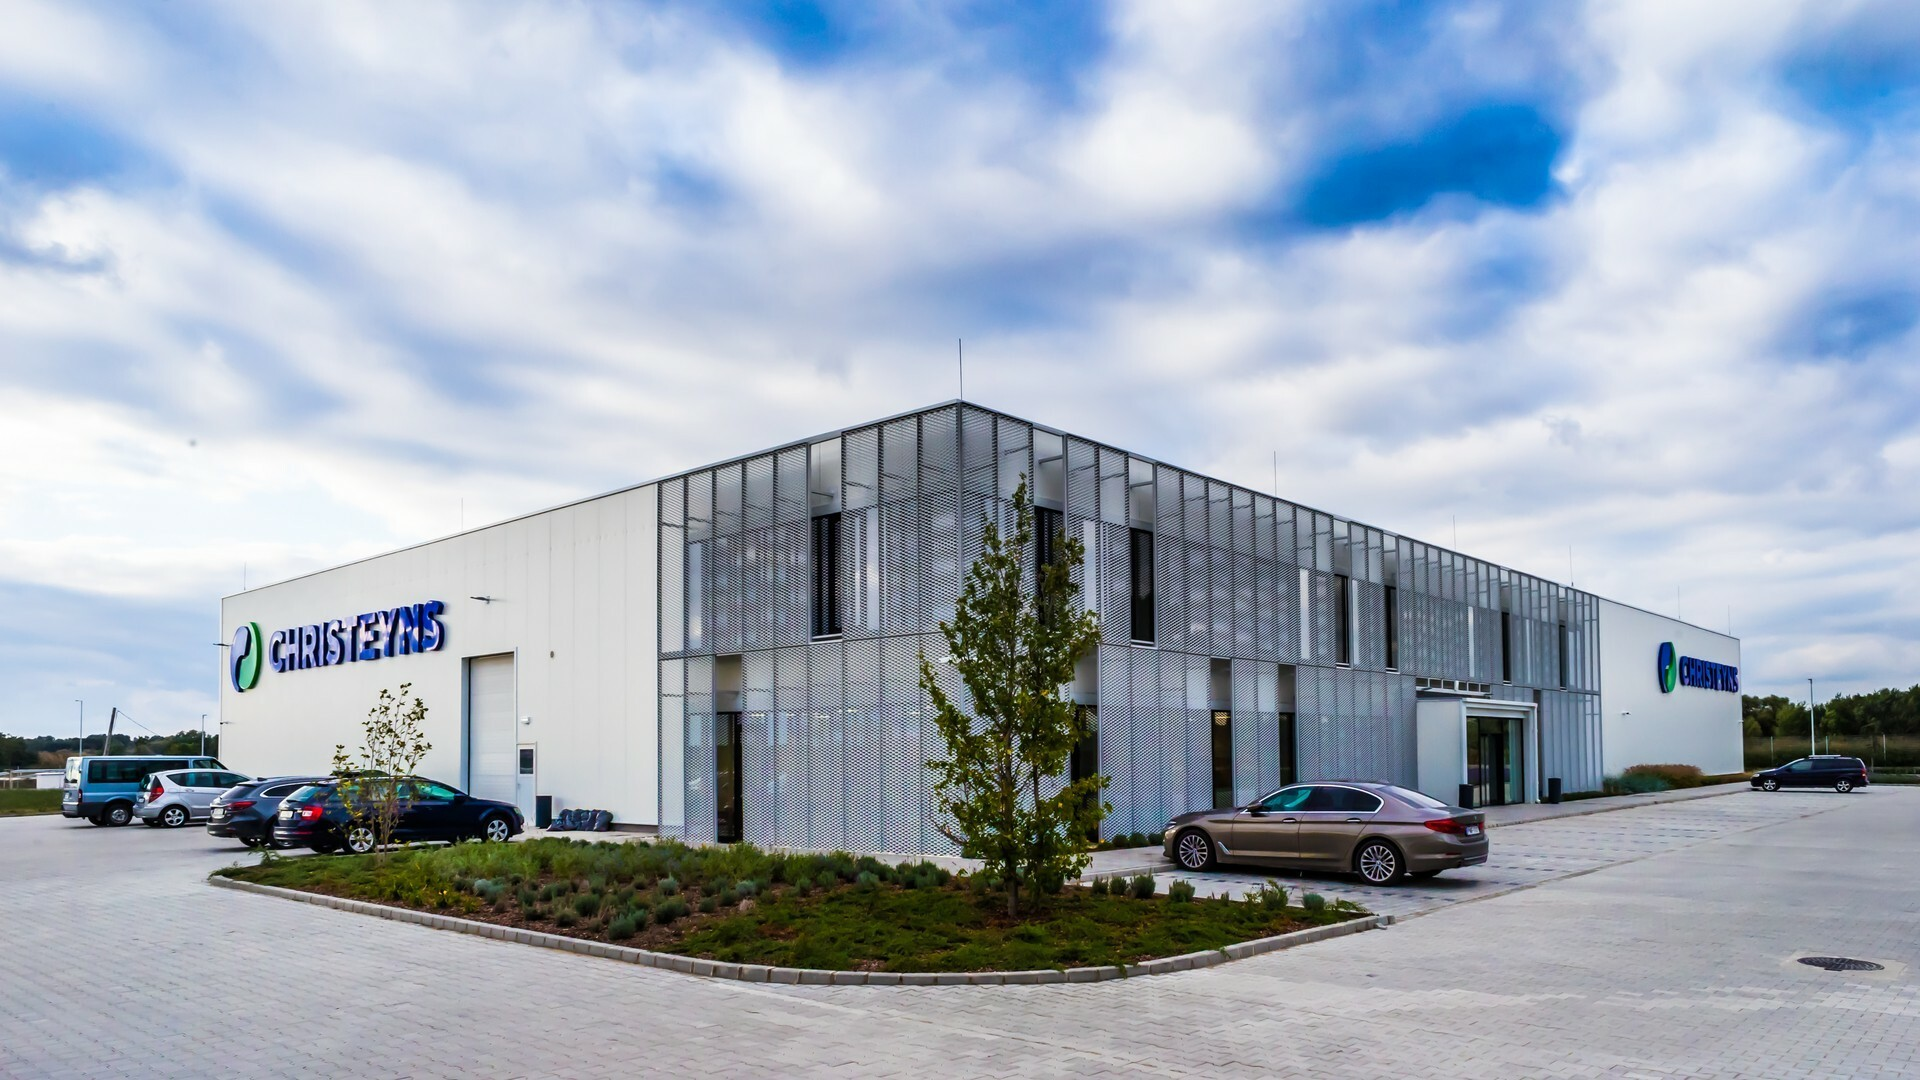 Modernes Multifunktionsgebäude in Ungarn